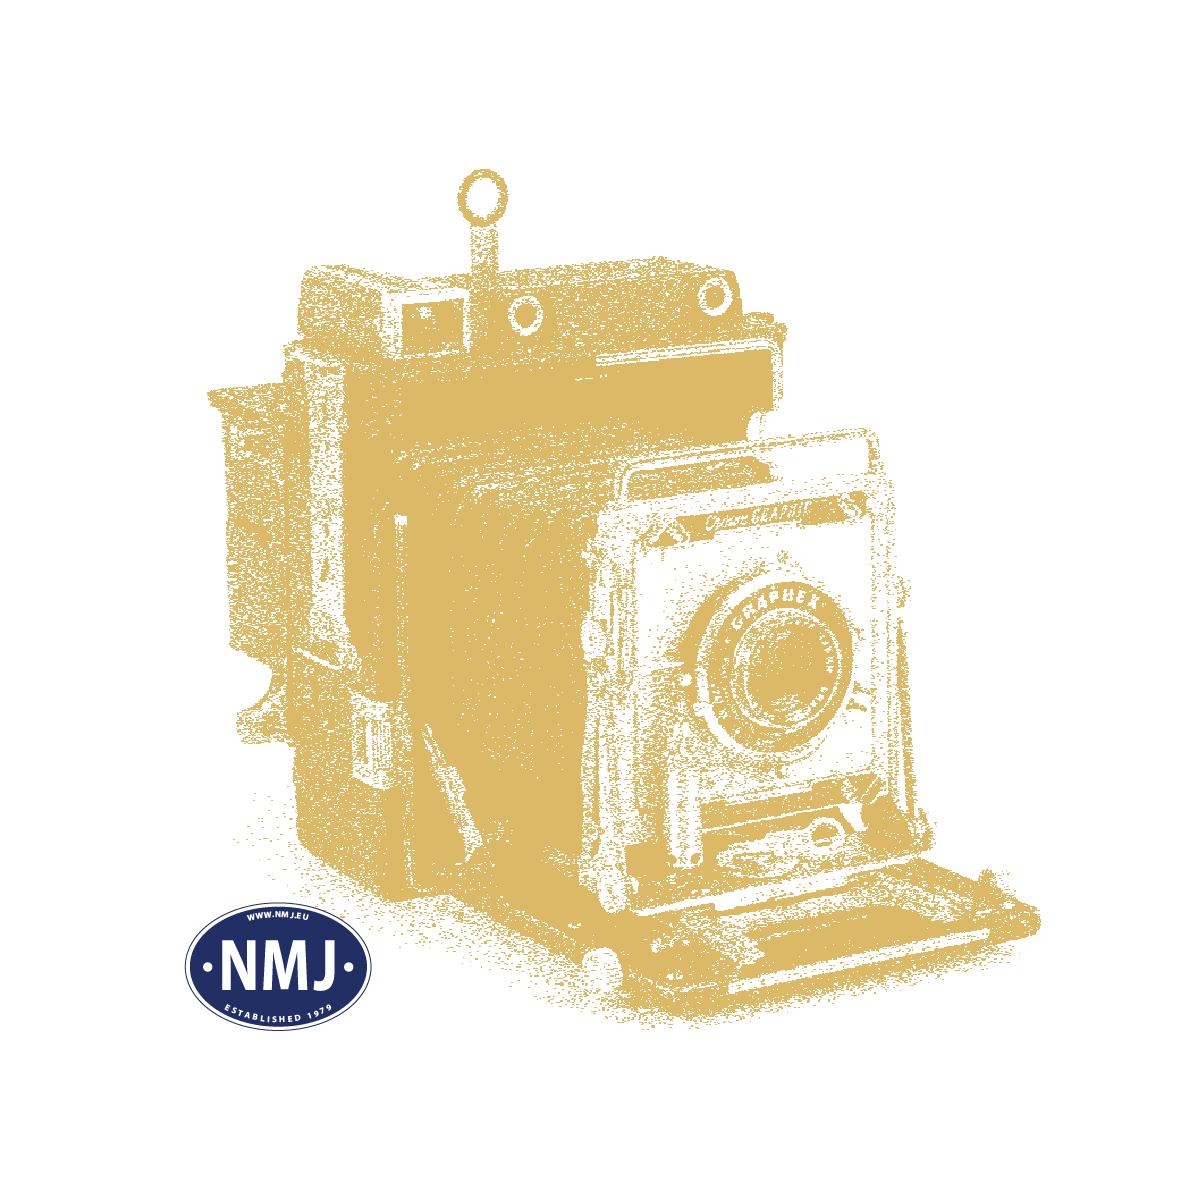 NMJ Topline NSB B3 DCC interiørlyssett m/ 4 hjulaksler